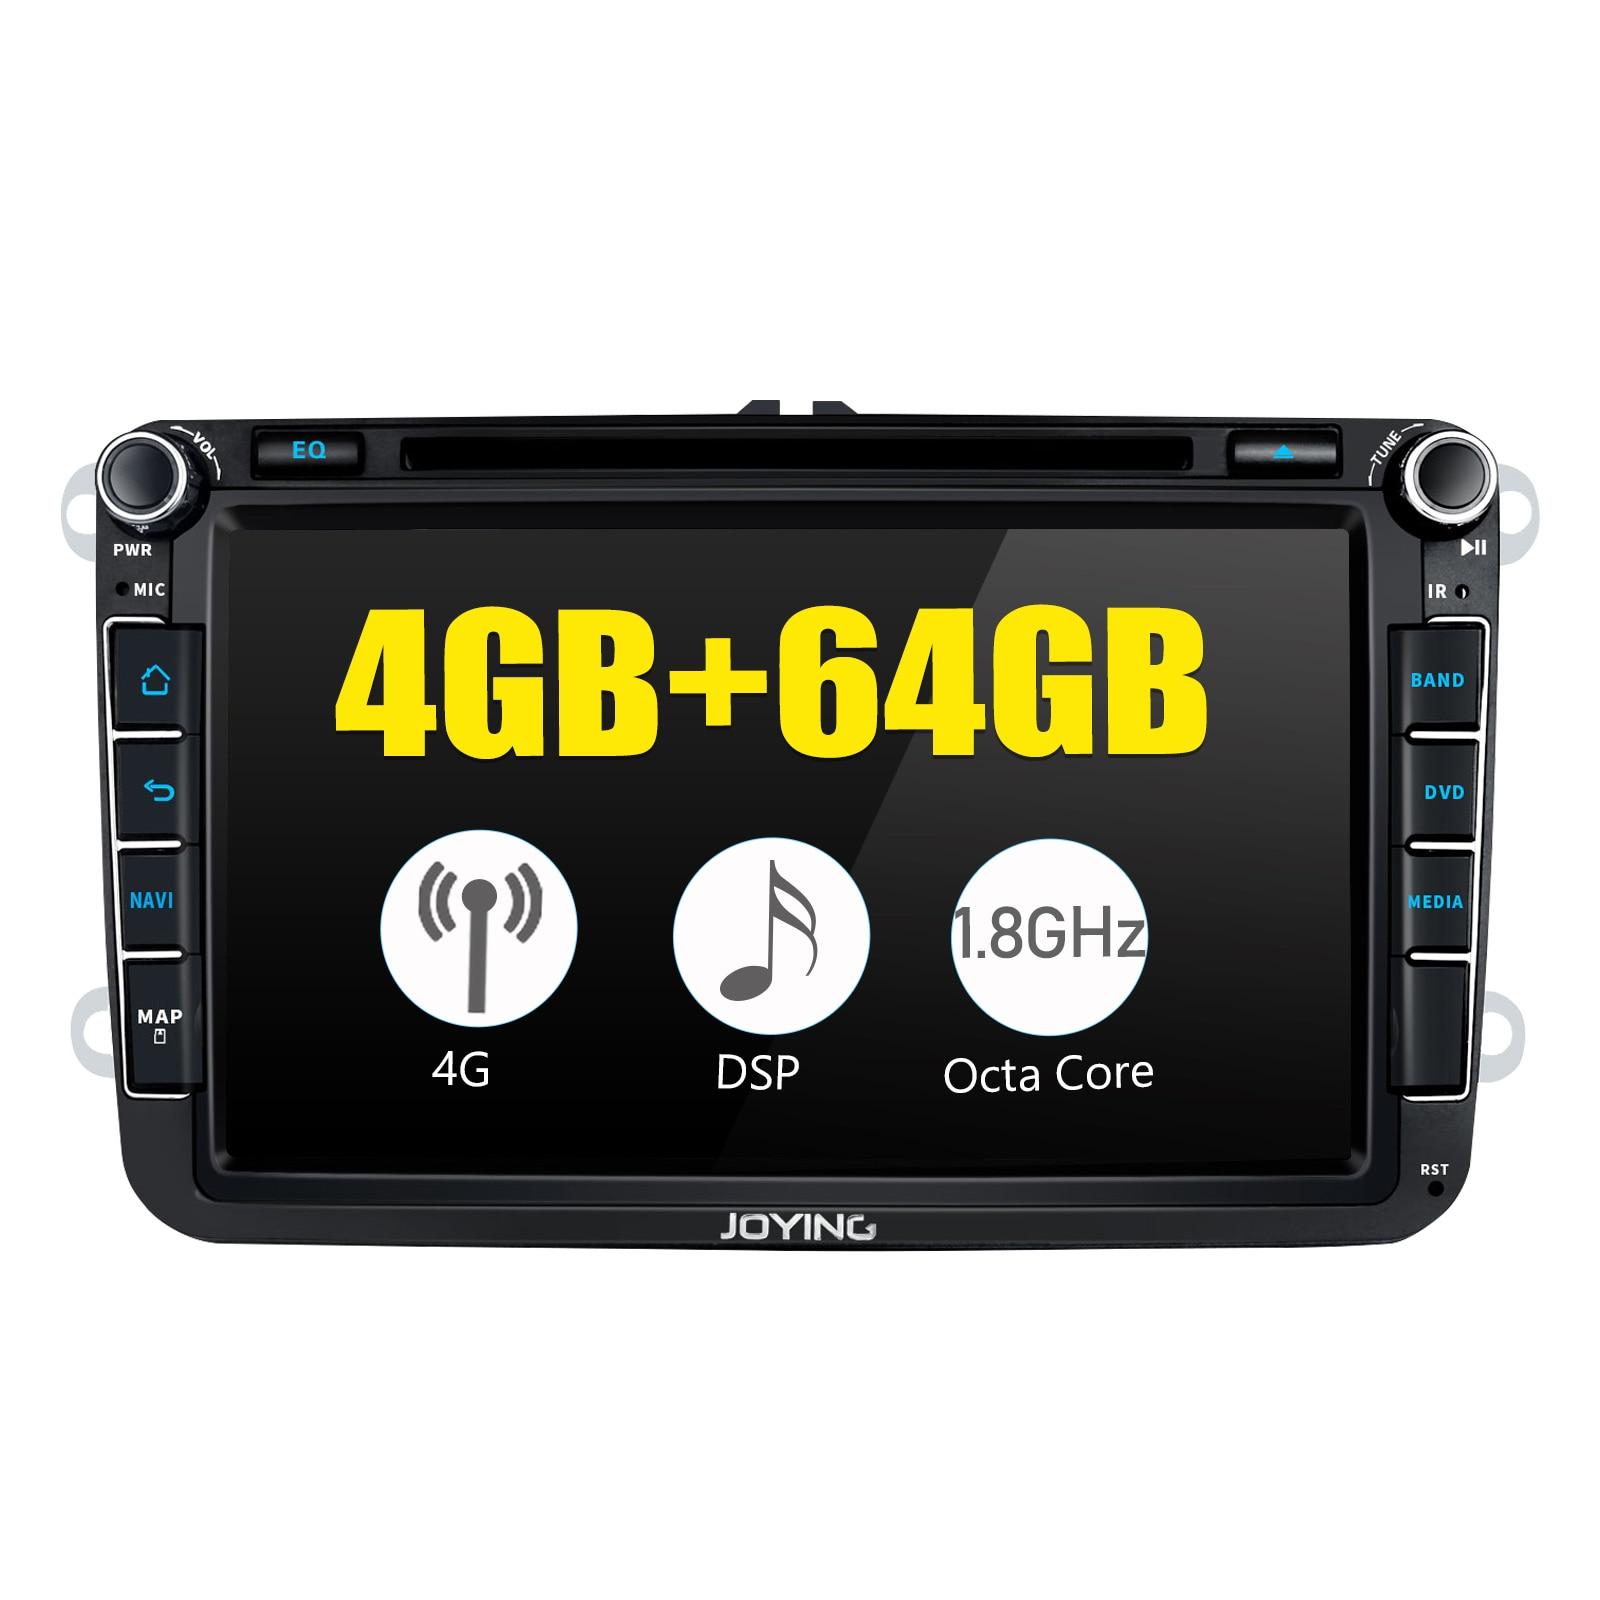 "JOYING 8 ""Android 8,1 4GB & 64GB 2 din Auto Radio GPS für VW GOLF 5/6 Polo passat b6 Jetta Tiguan Touran Skoda sitz KEINE DVD-player"